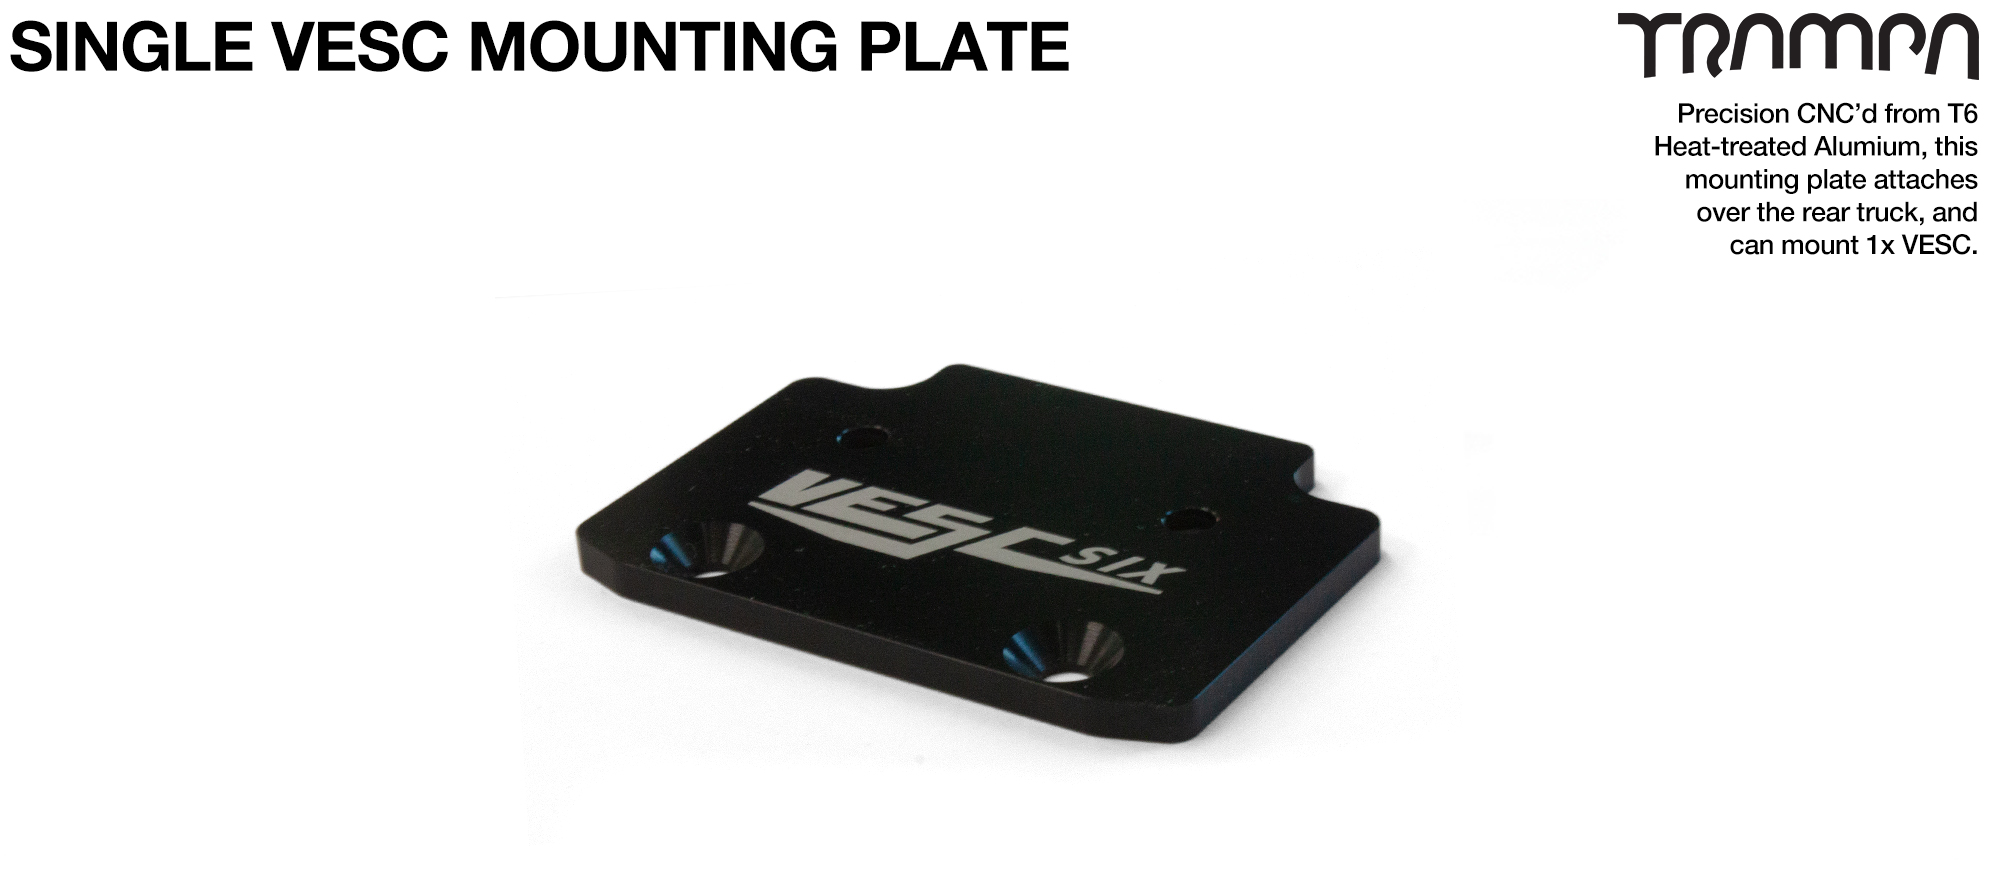 ALUMINIUM mounting Plate for Single VESC